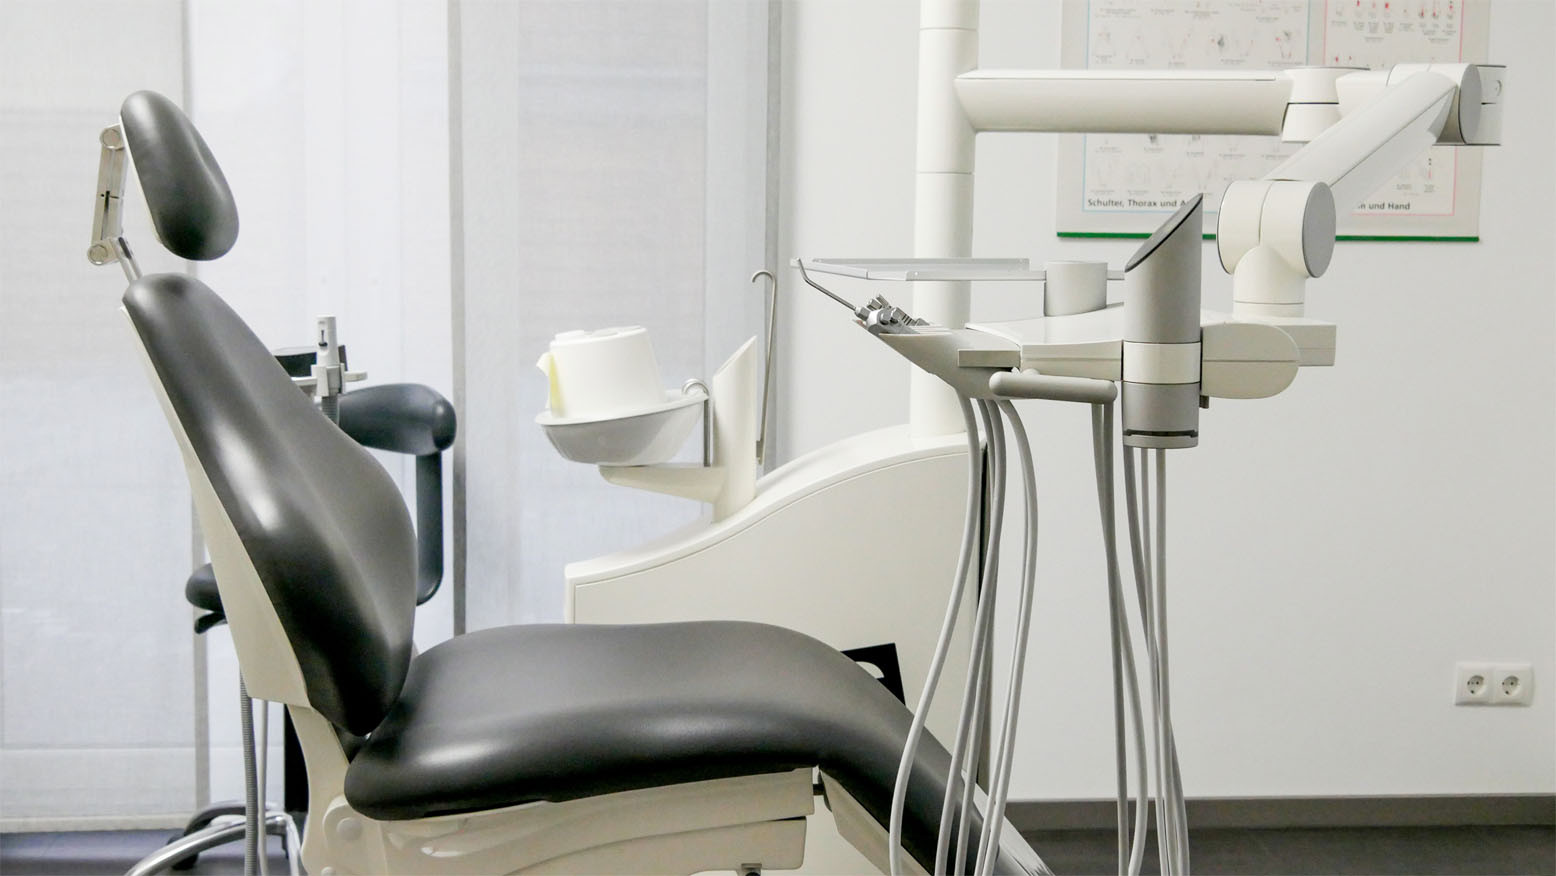 Zahnarzt Praxis Sankt Augustin